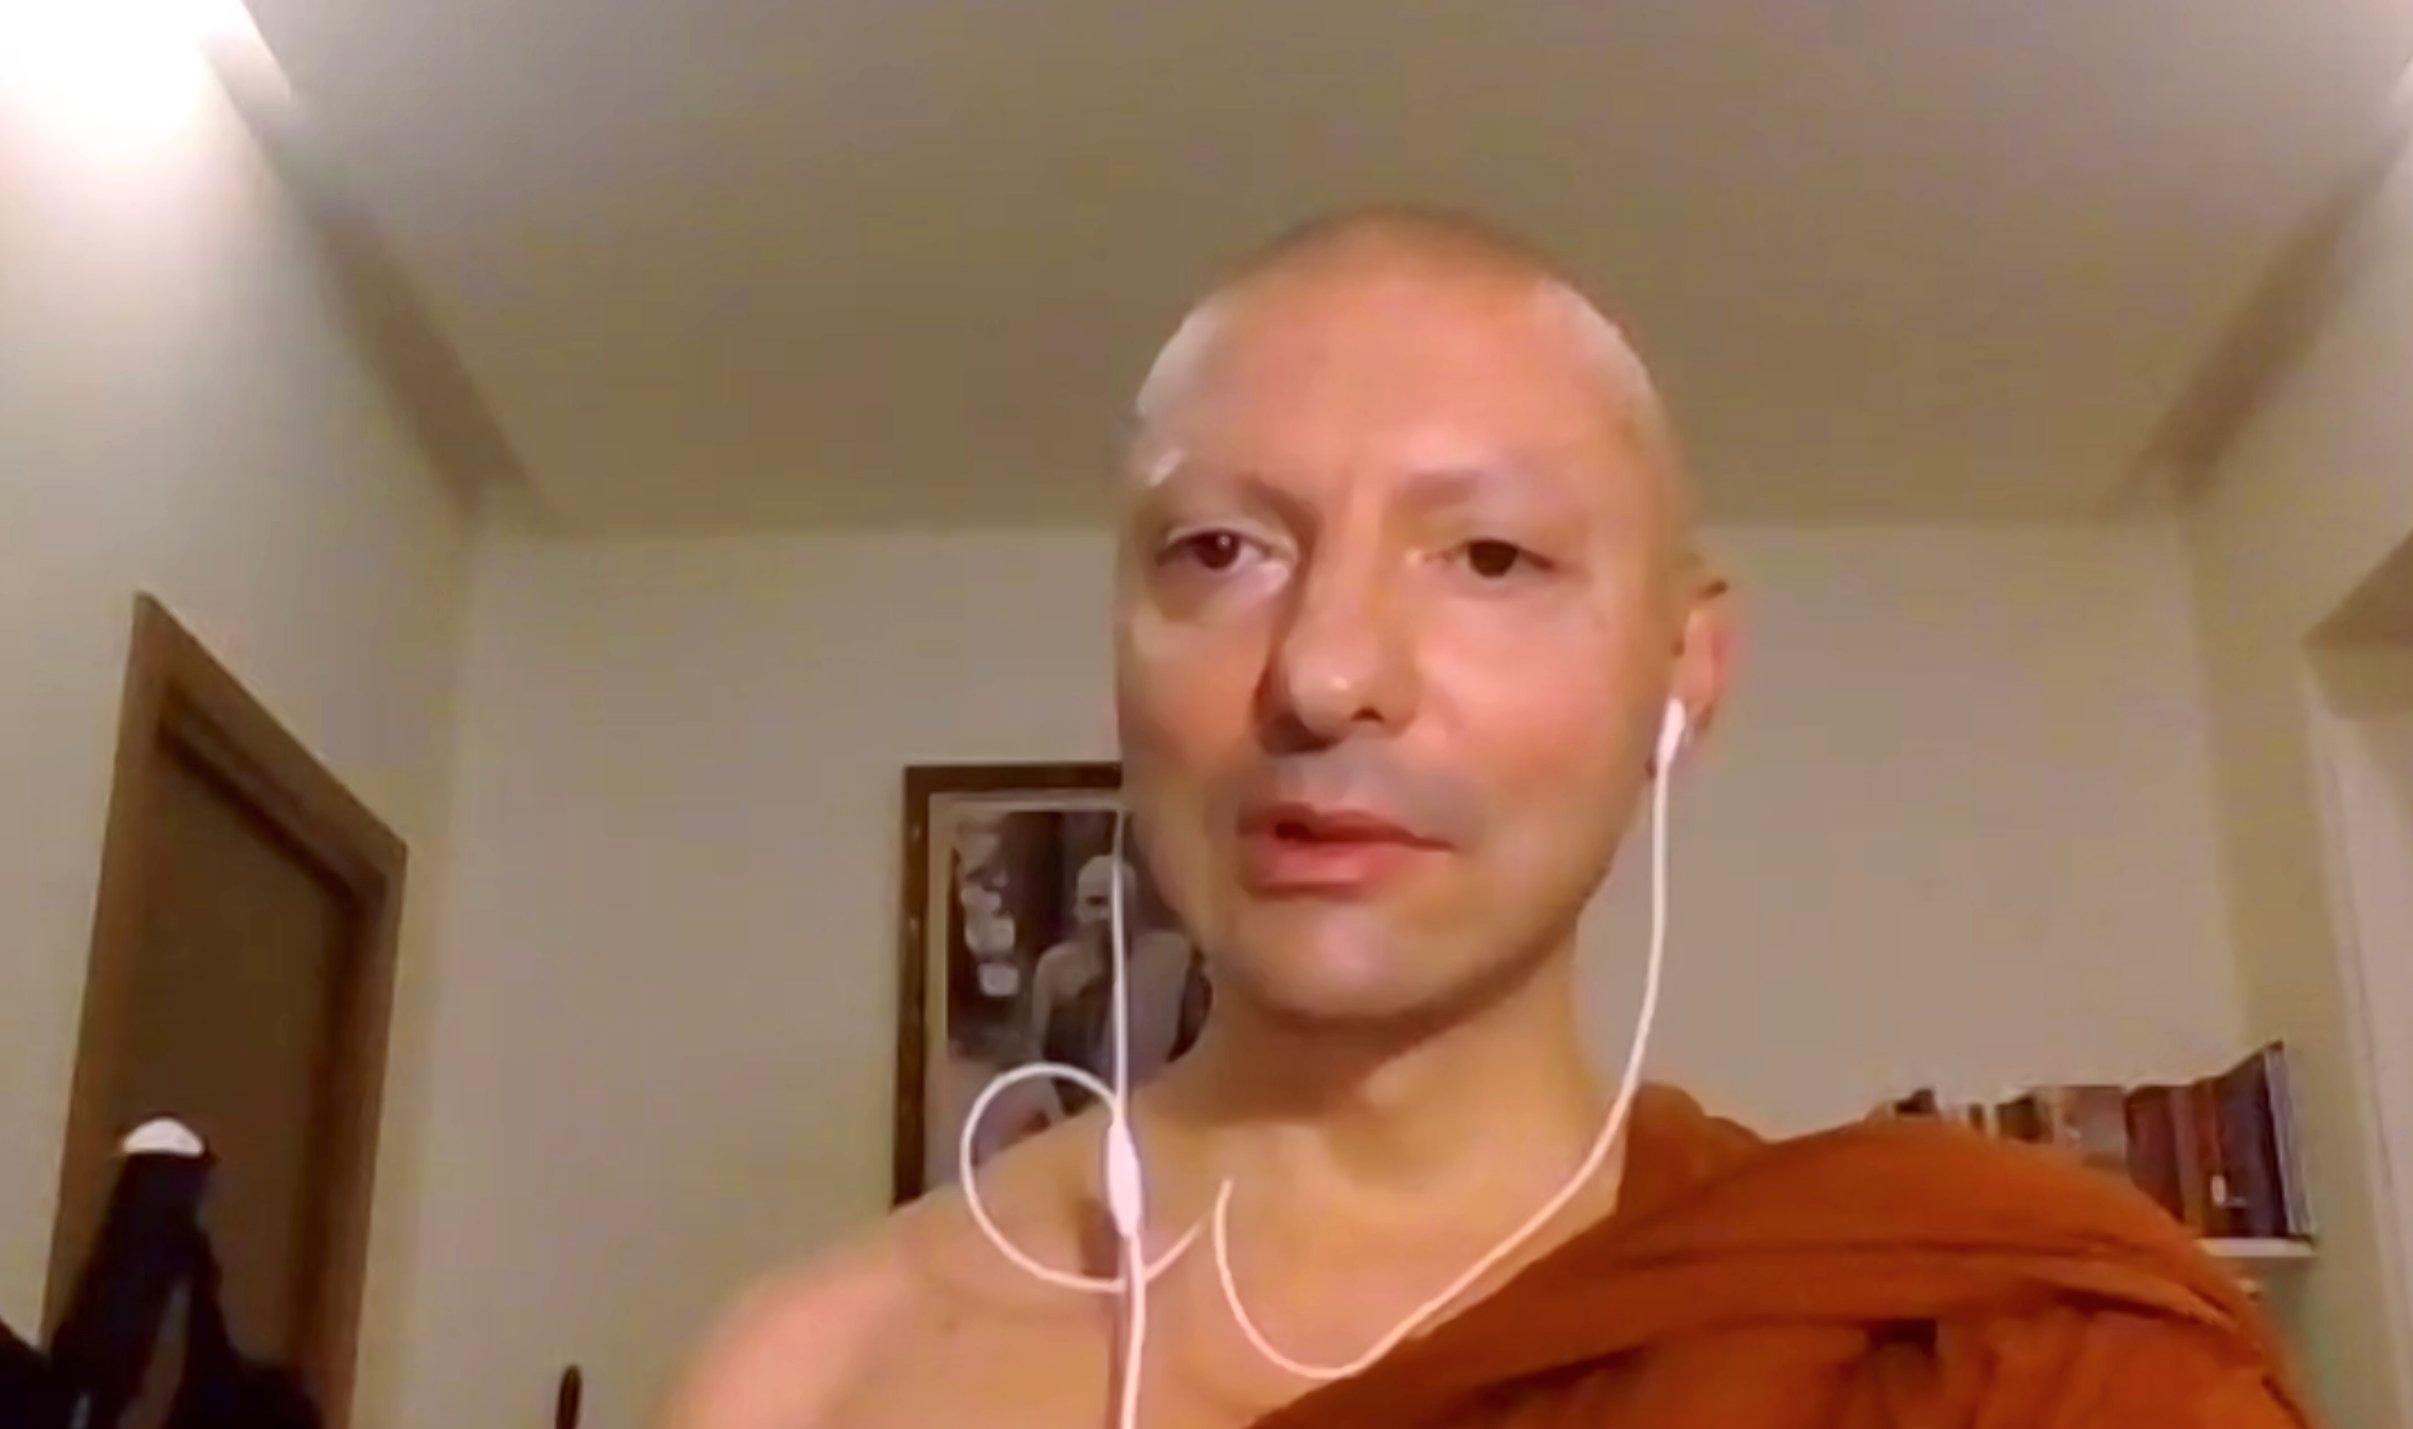 Ajahn Mahapañño: riflessioni e risposte sulla pratica spirituale